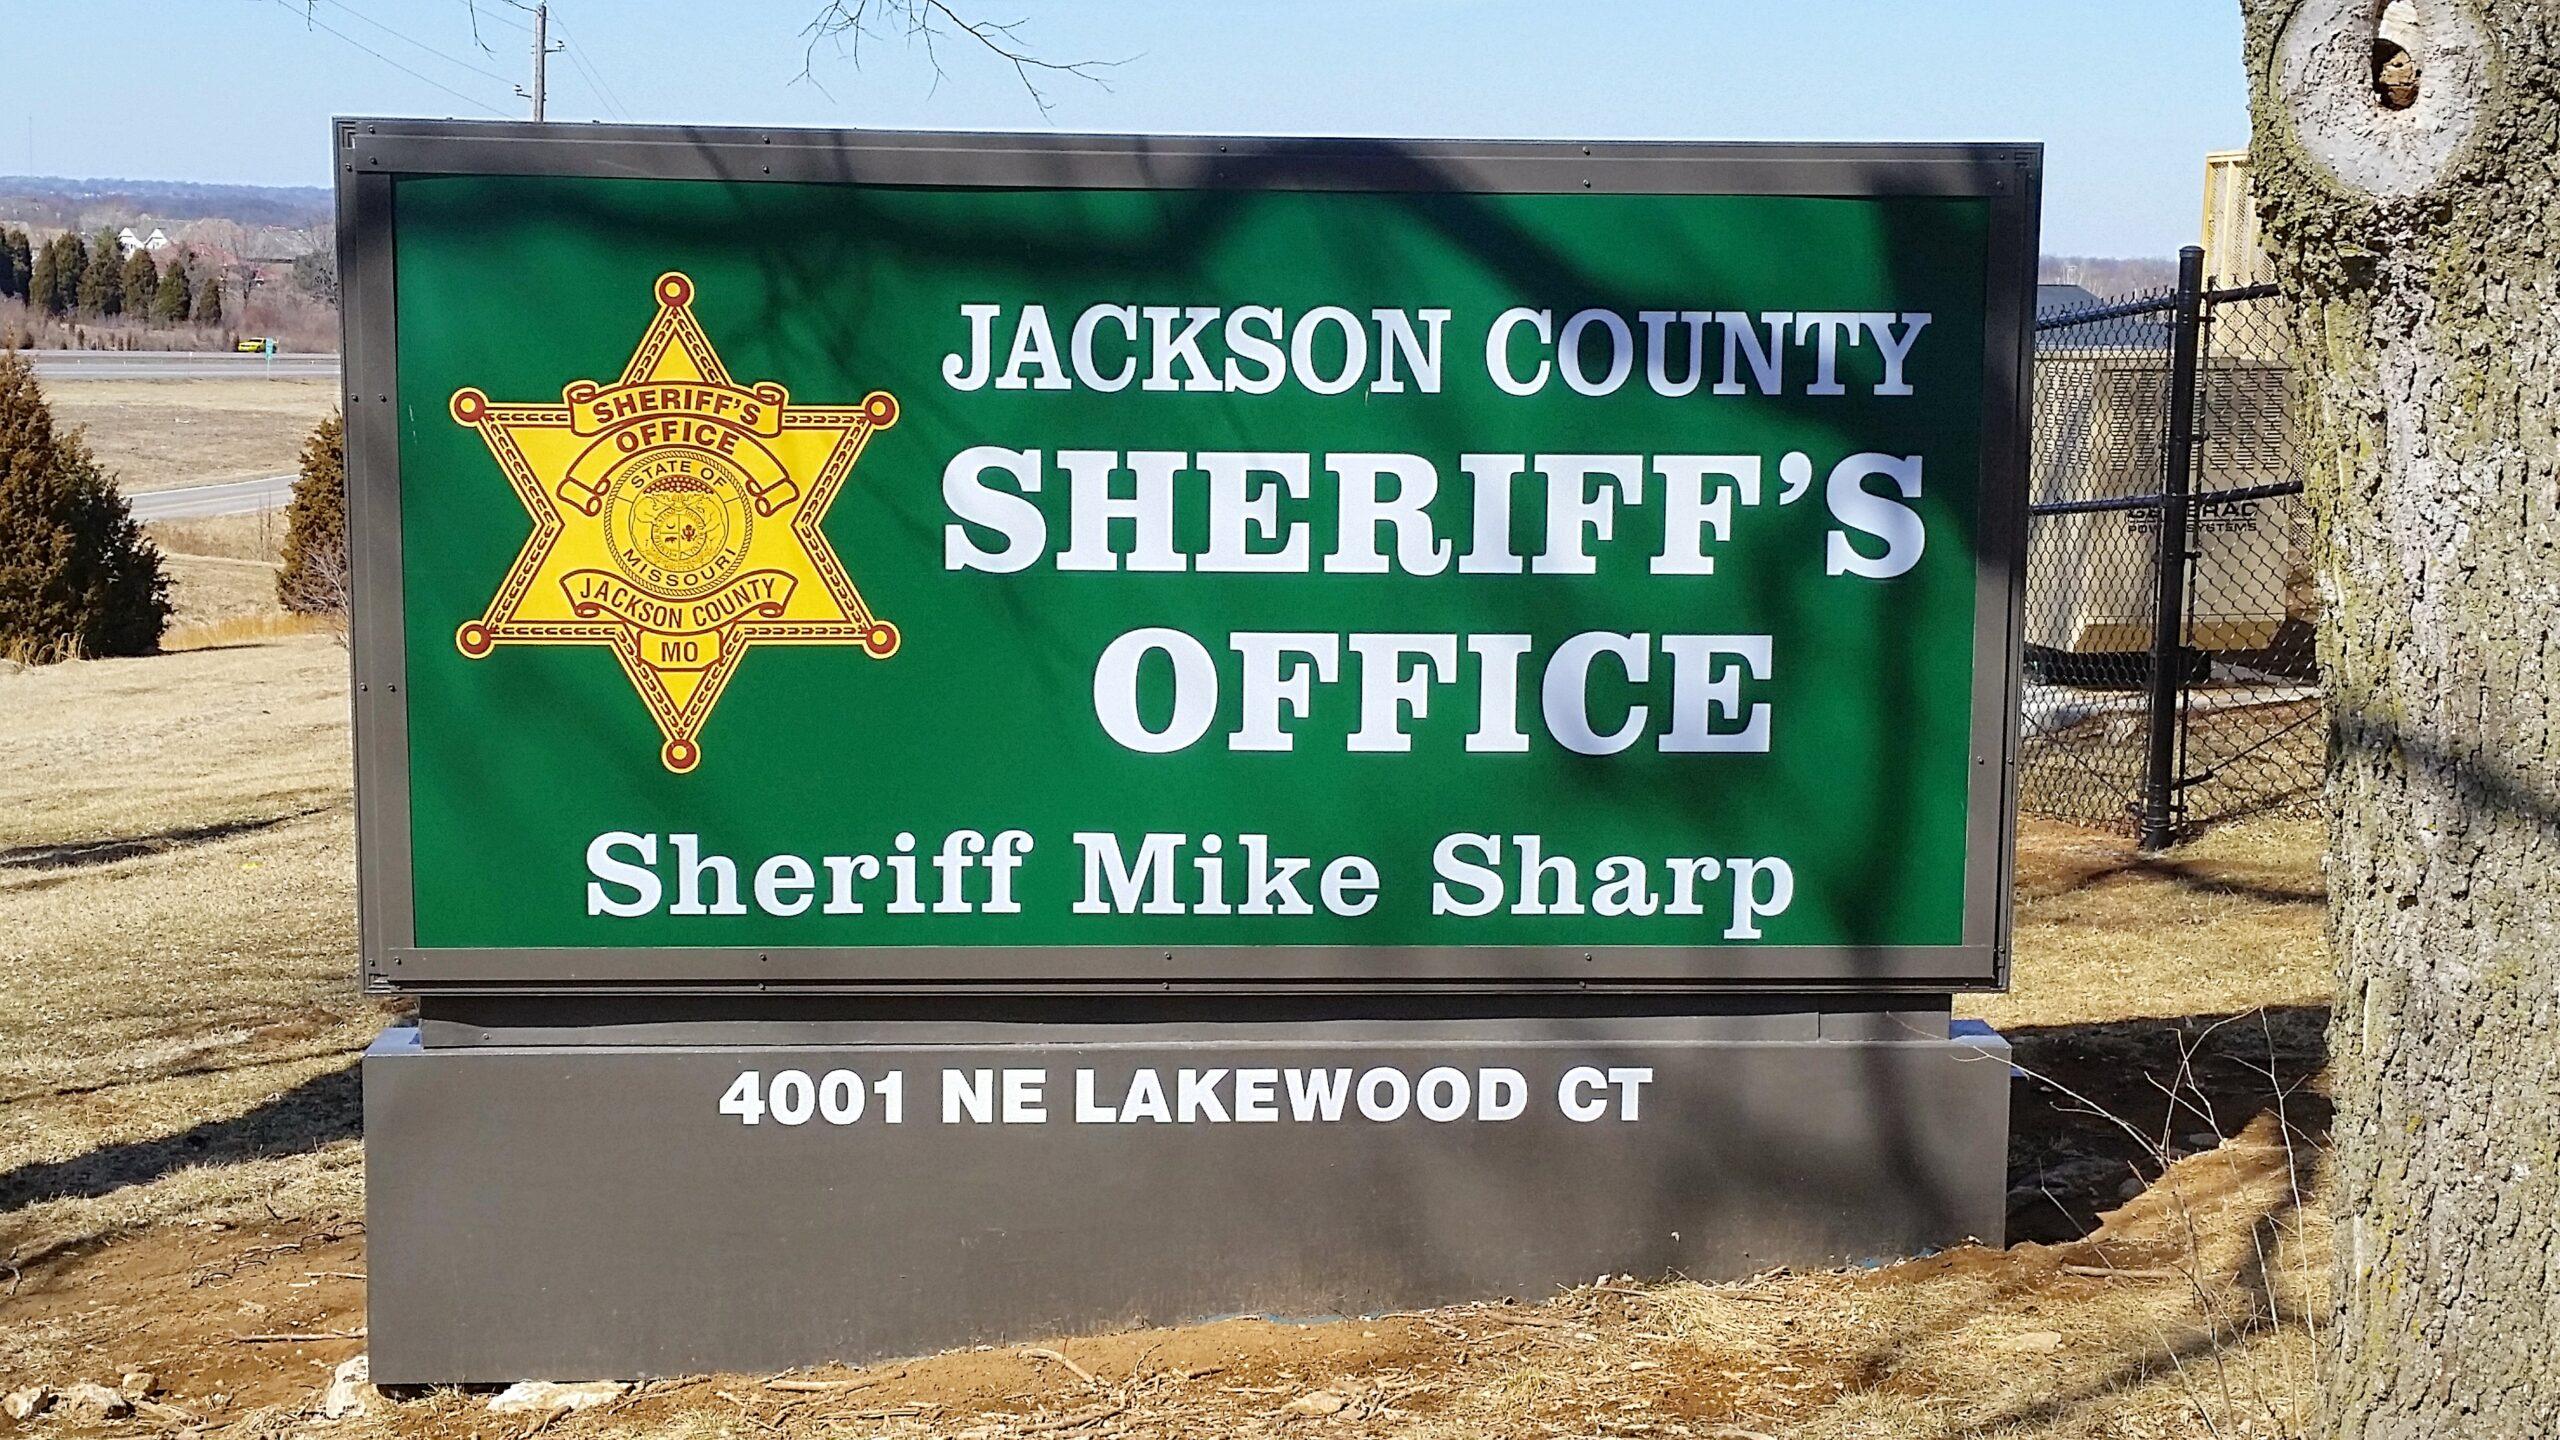 jackson county sherrif's office